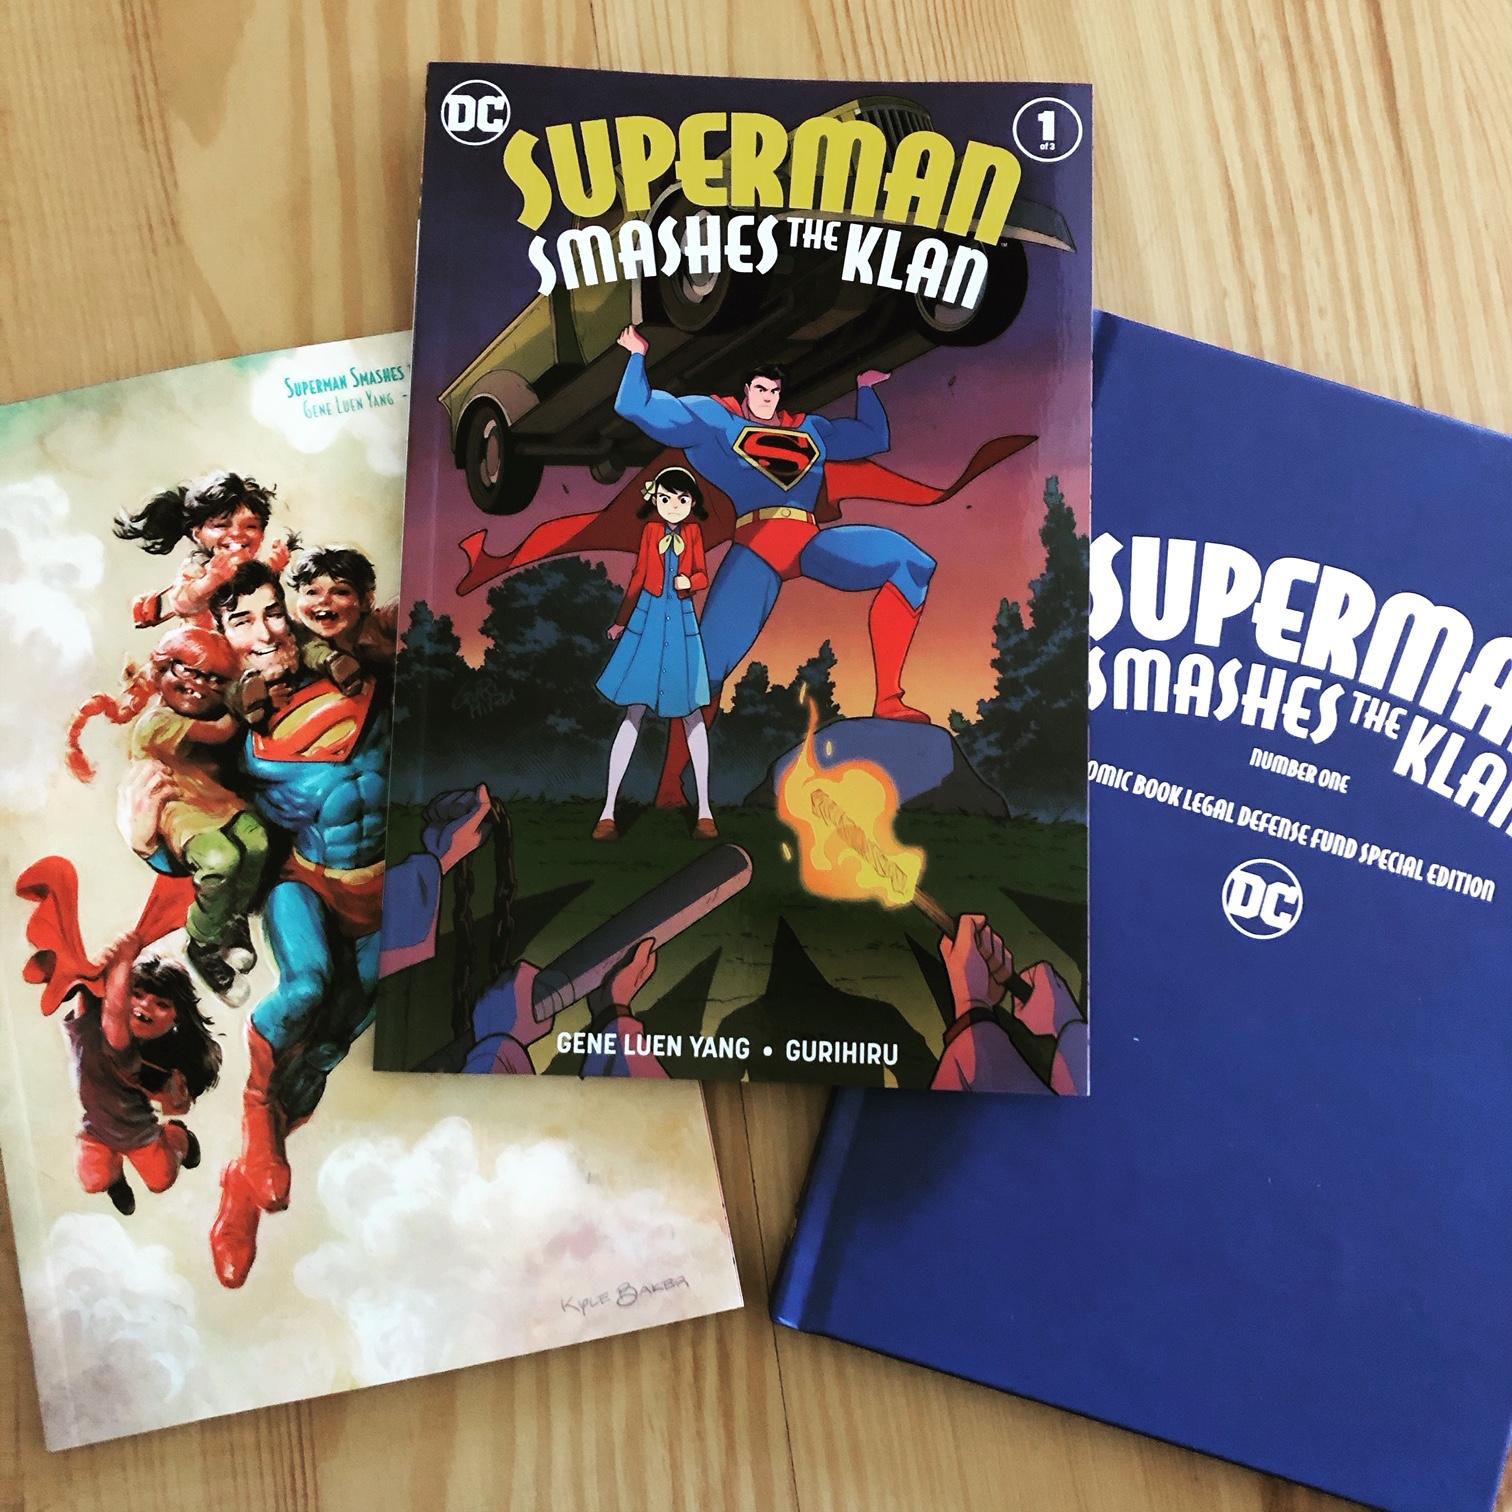 Superman Smashes the Klan on October 16!